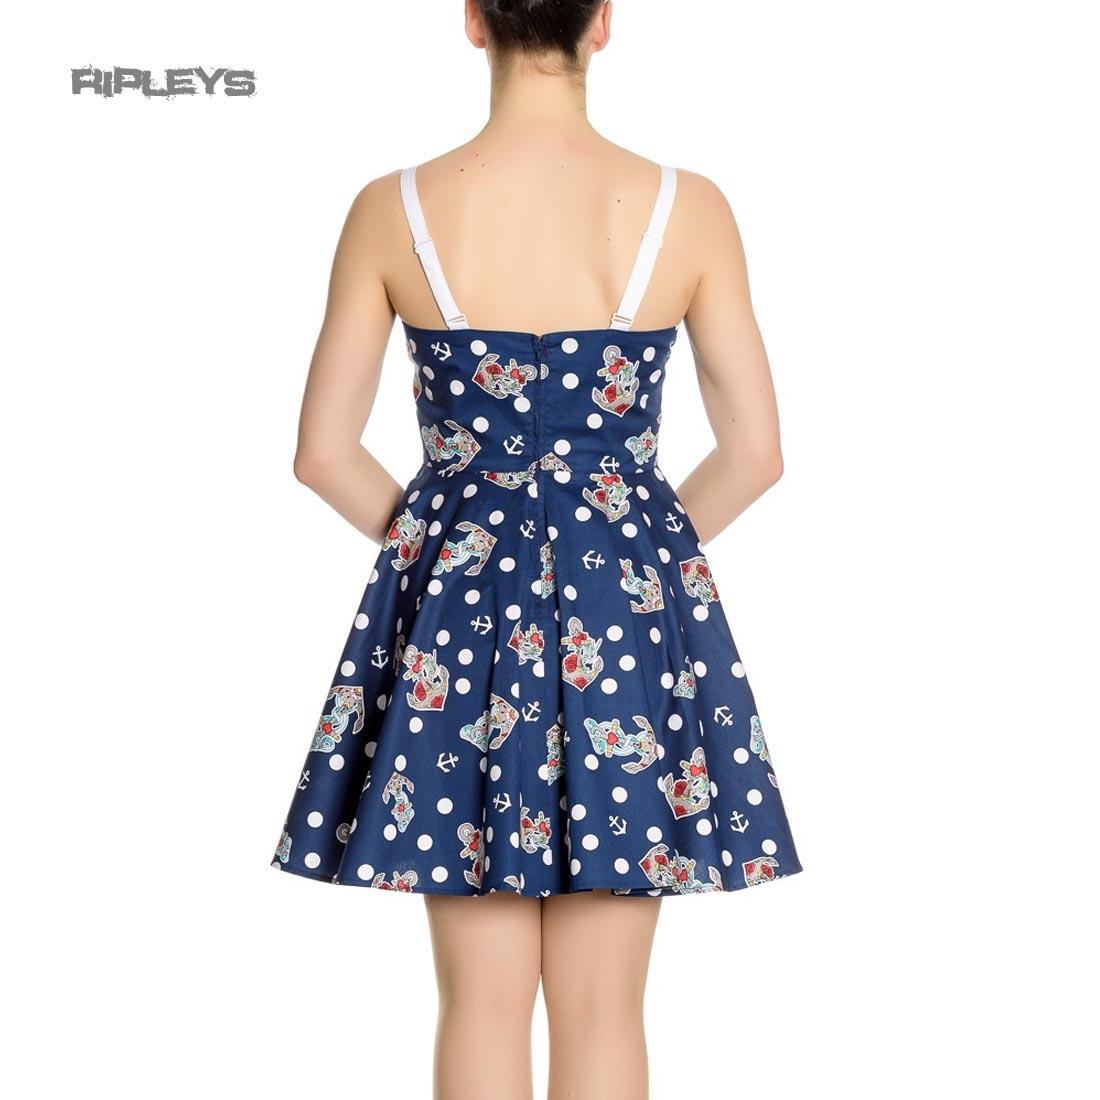 Hell-Bunny-Navy-Blue-50s-Nautical-Mini-Dress-OCEANA-Polka-Dot-All-Sizes thumbnail 20